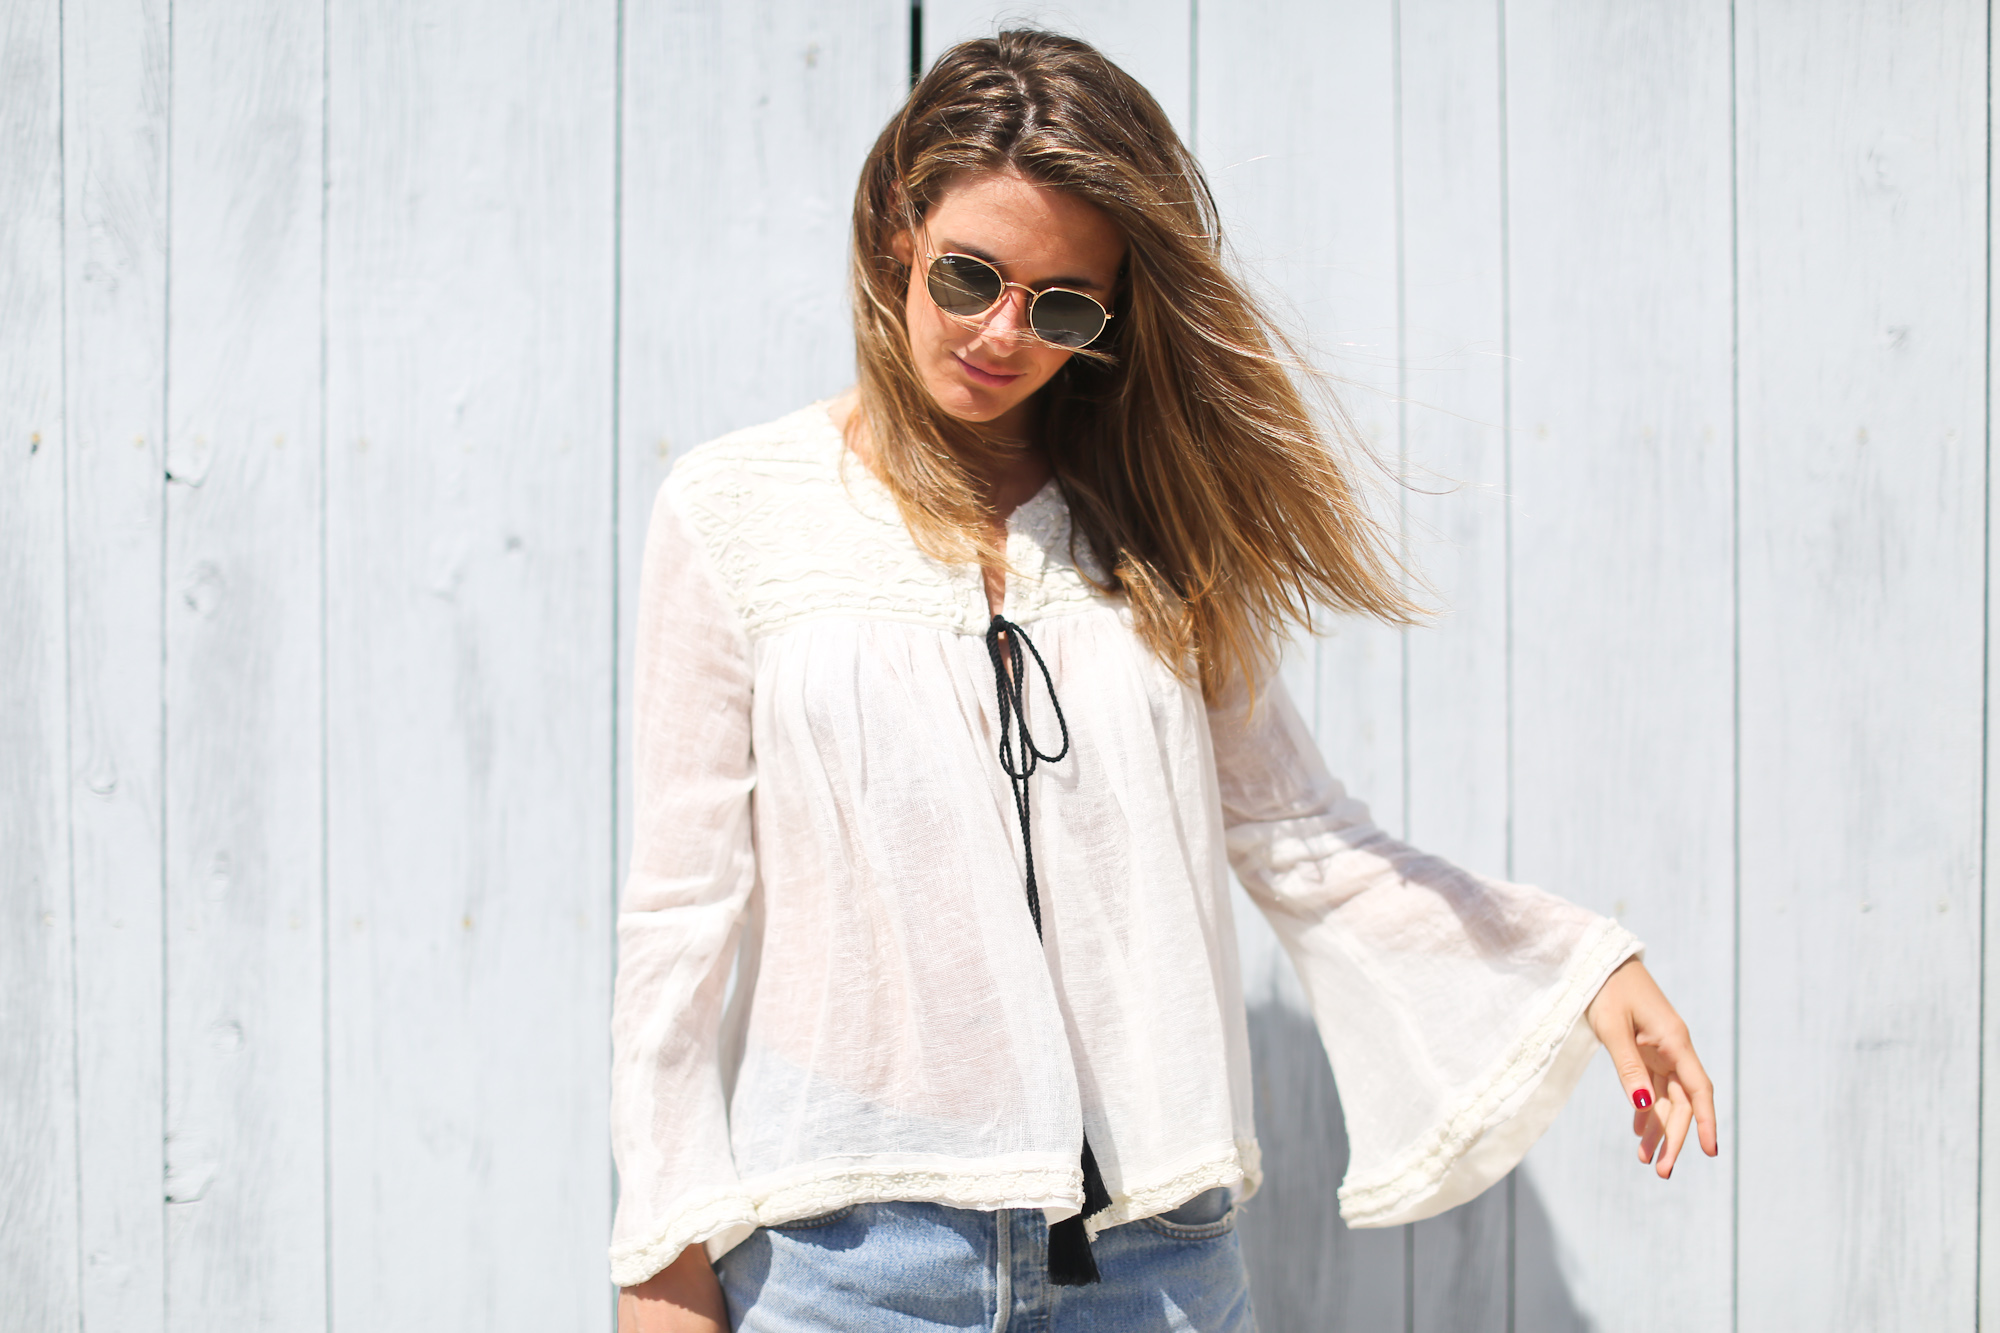 Clochet_streetstyle_zara_embroided_linen_kimonojacket_vintagelevis501shorts-2